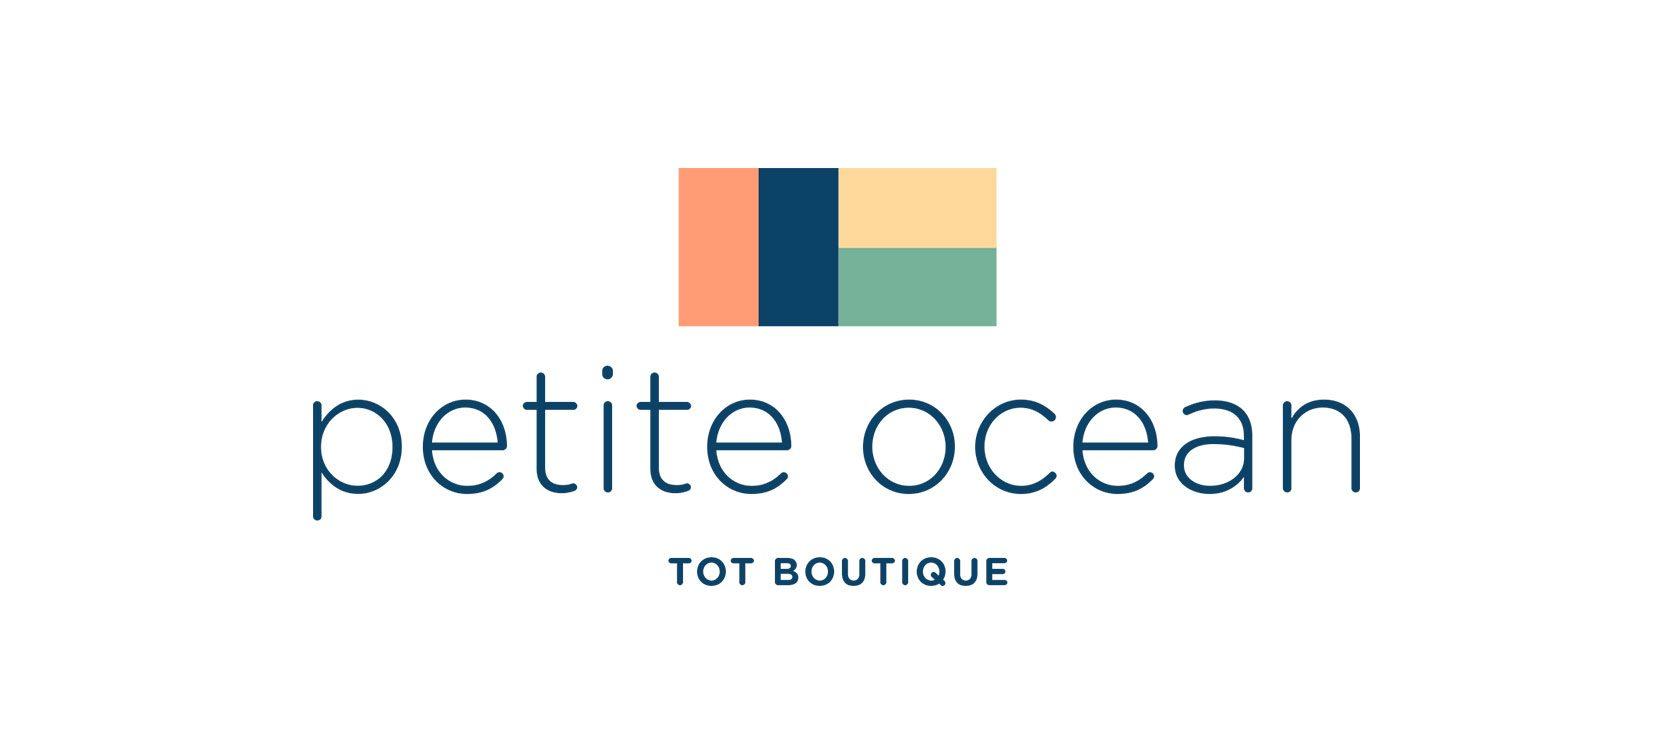 Petite Ocean Logo and Branding Design by Furia